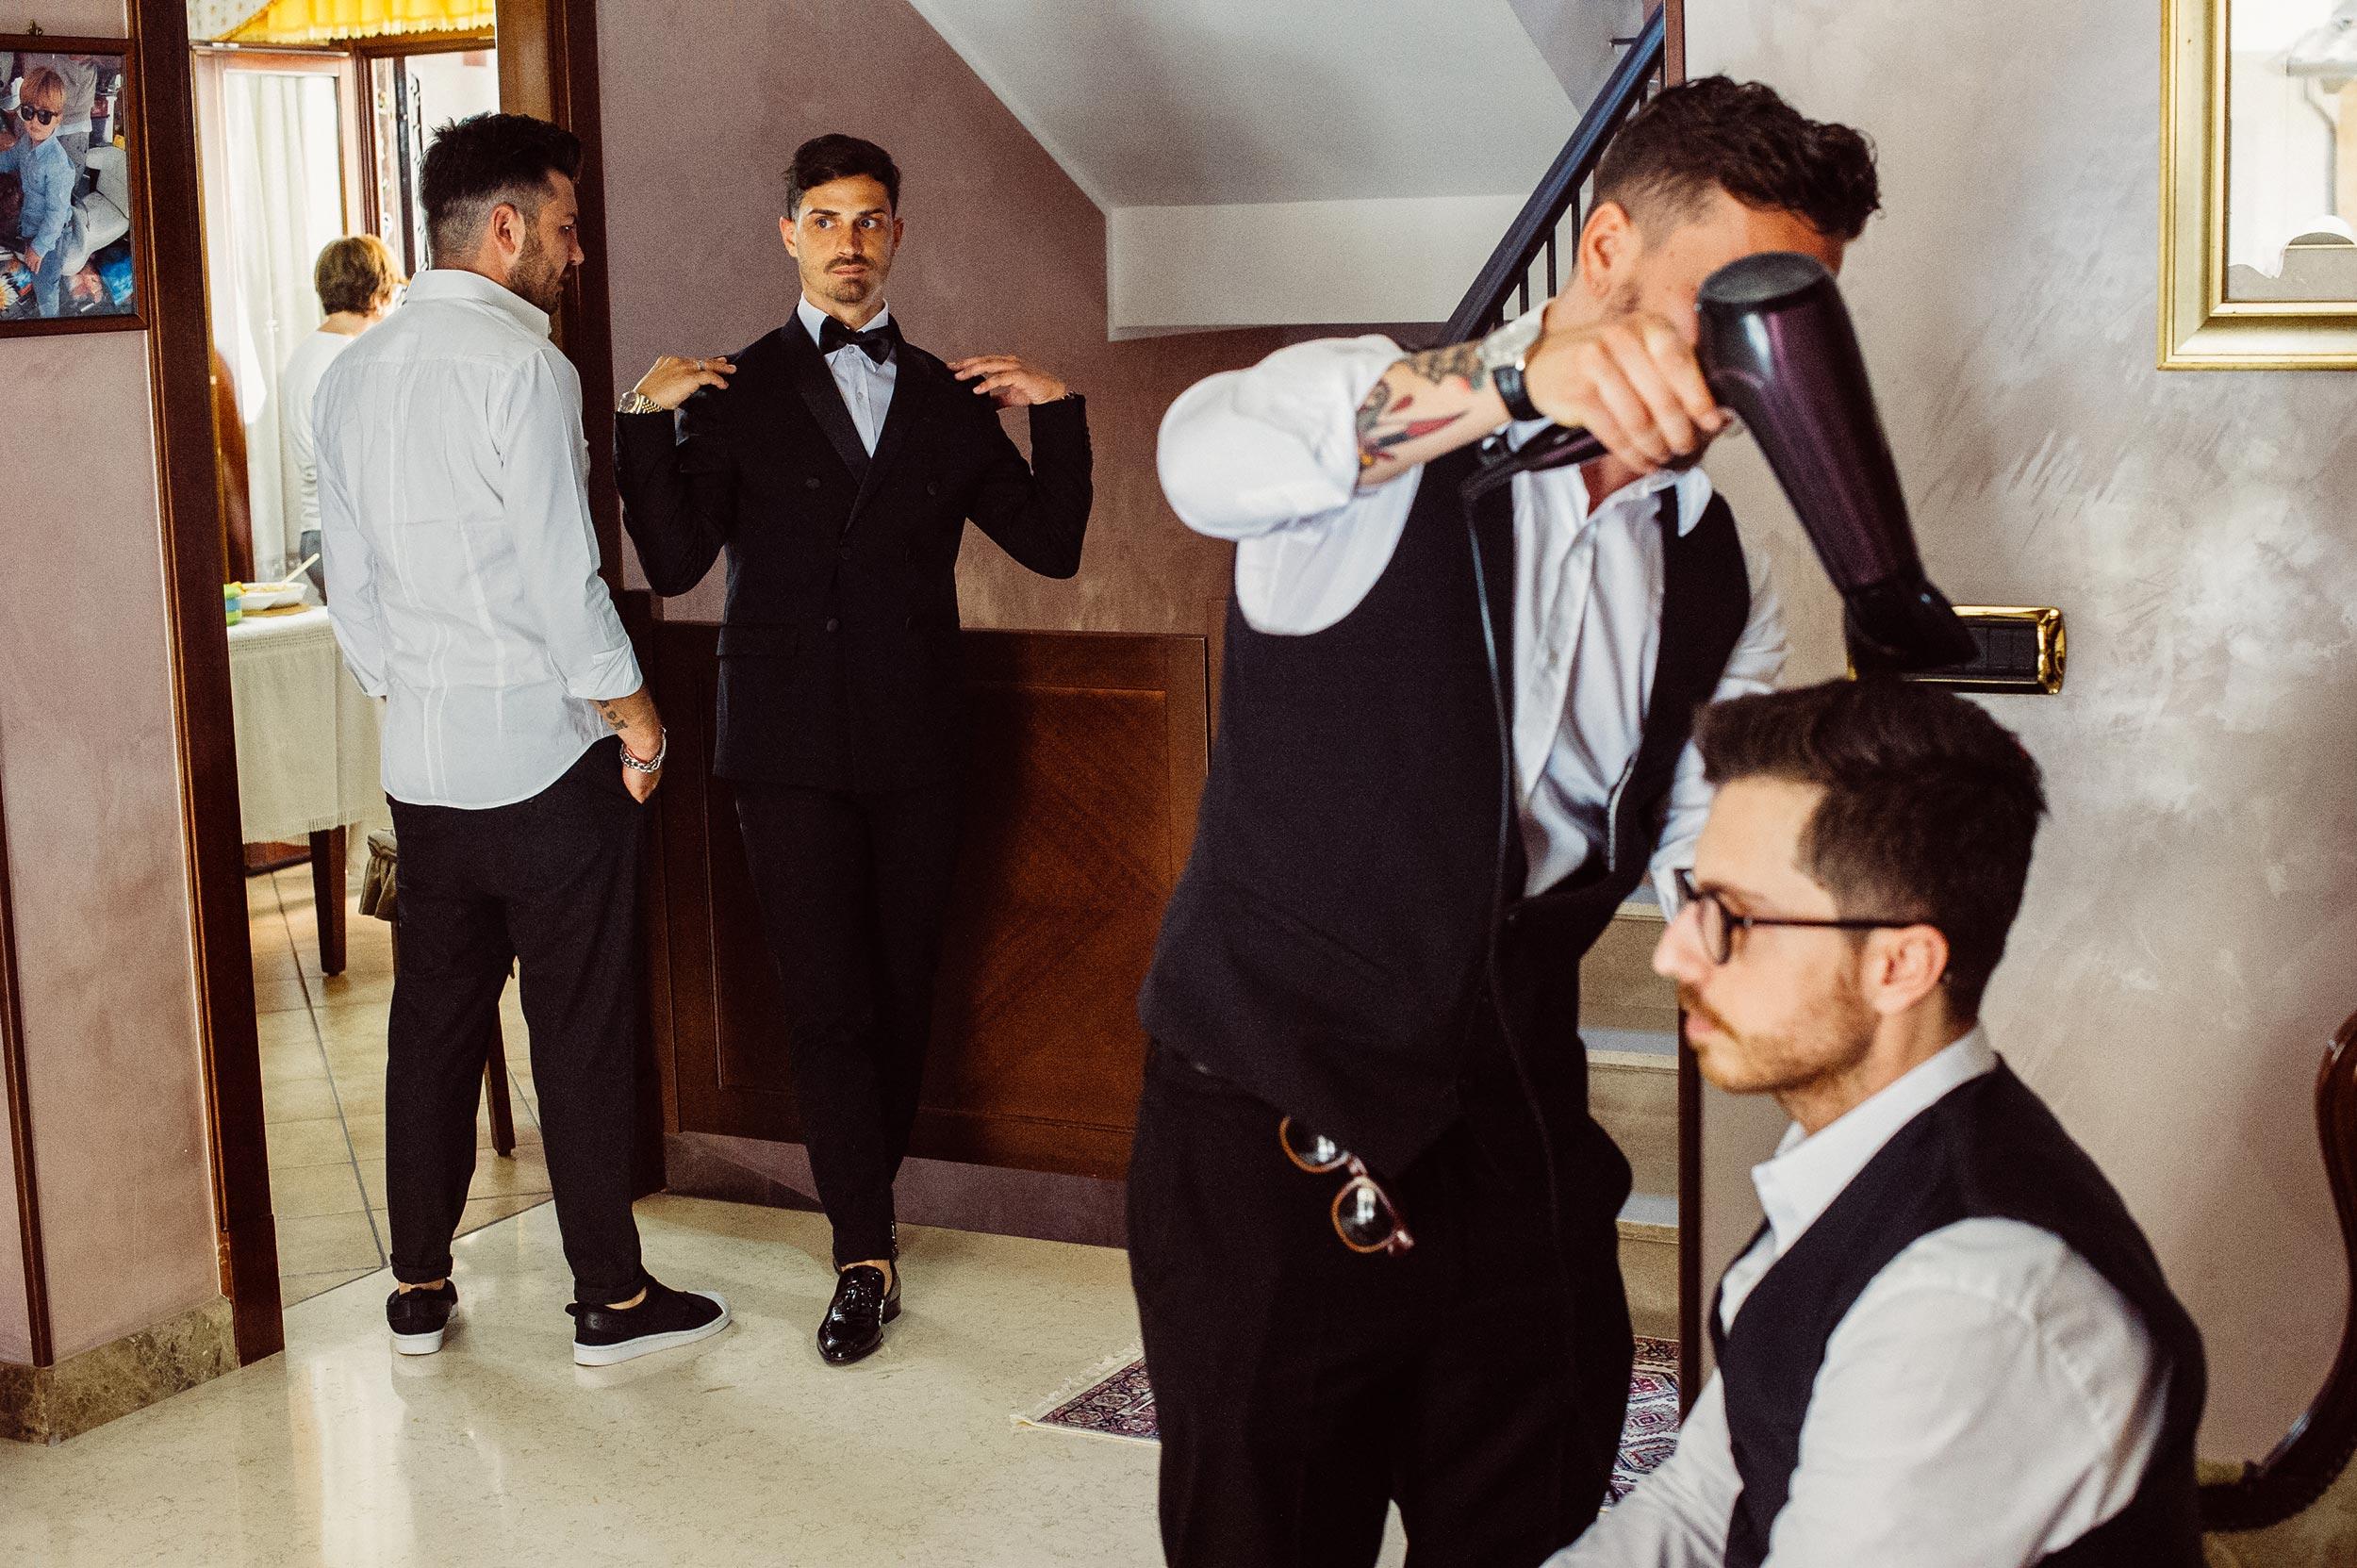 2016-Claudio-Teresa-Naples-Wedding-Photographer-Italy-Alessandro-Avenali-10.jpg